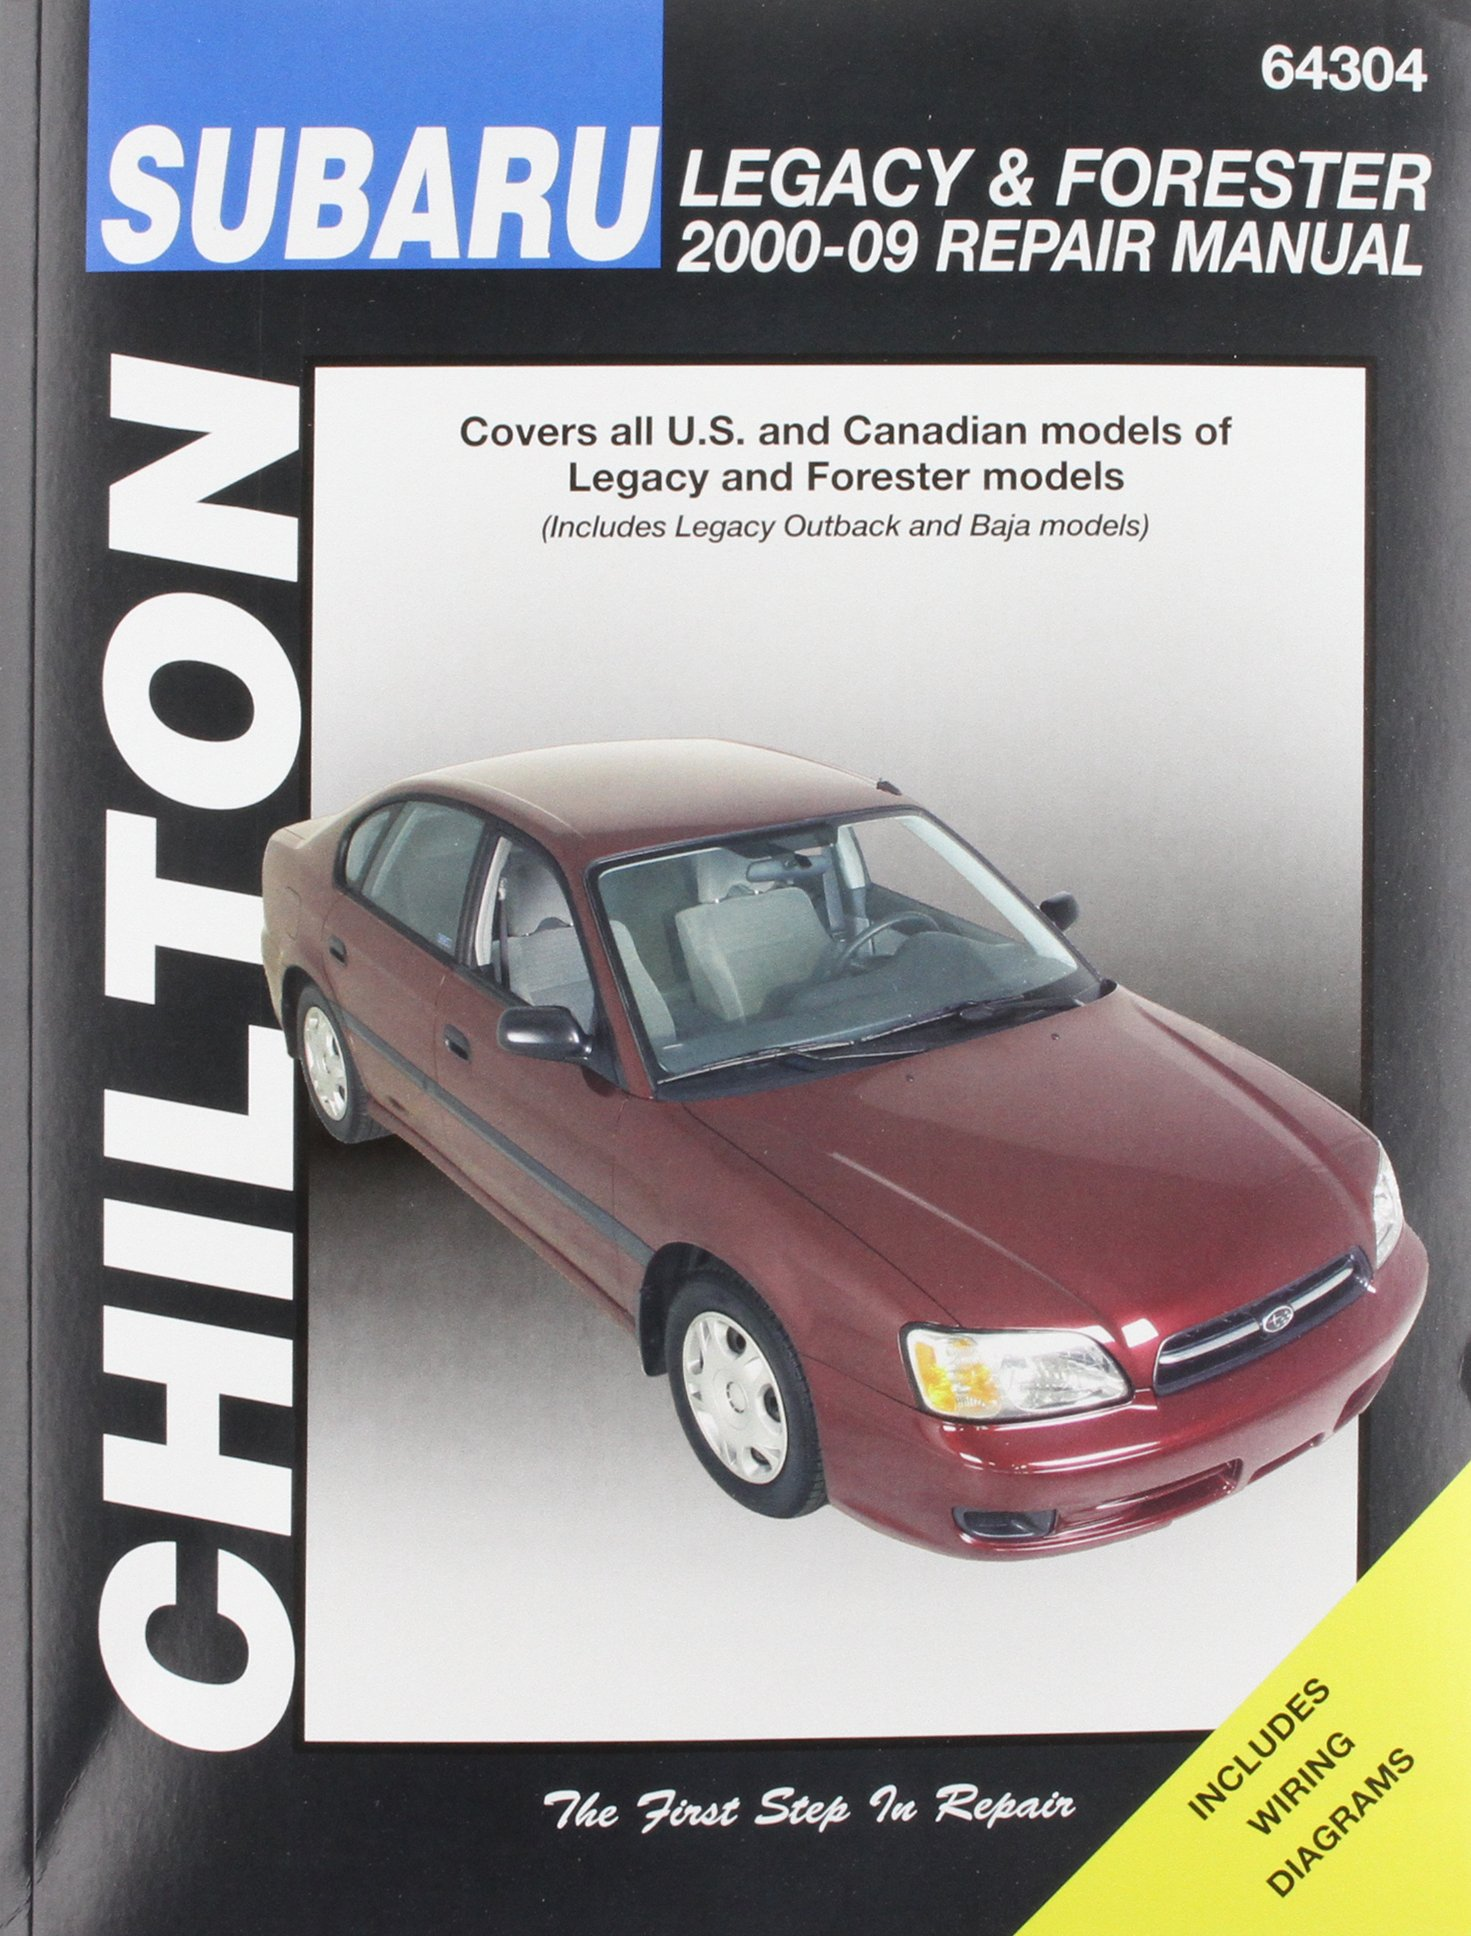 Chilton Total Car Care Subaru Legacy 2000-2009 & Forester 2000-2008 Repair Manual Chiltons Total Car Care Repair Manual: Amazon.es: Robert Maddox, ...